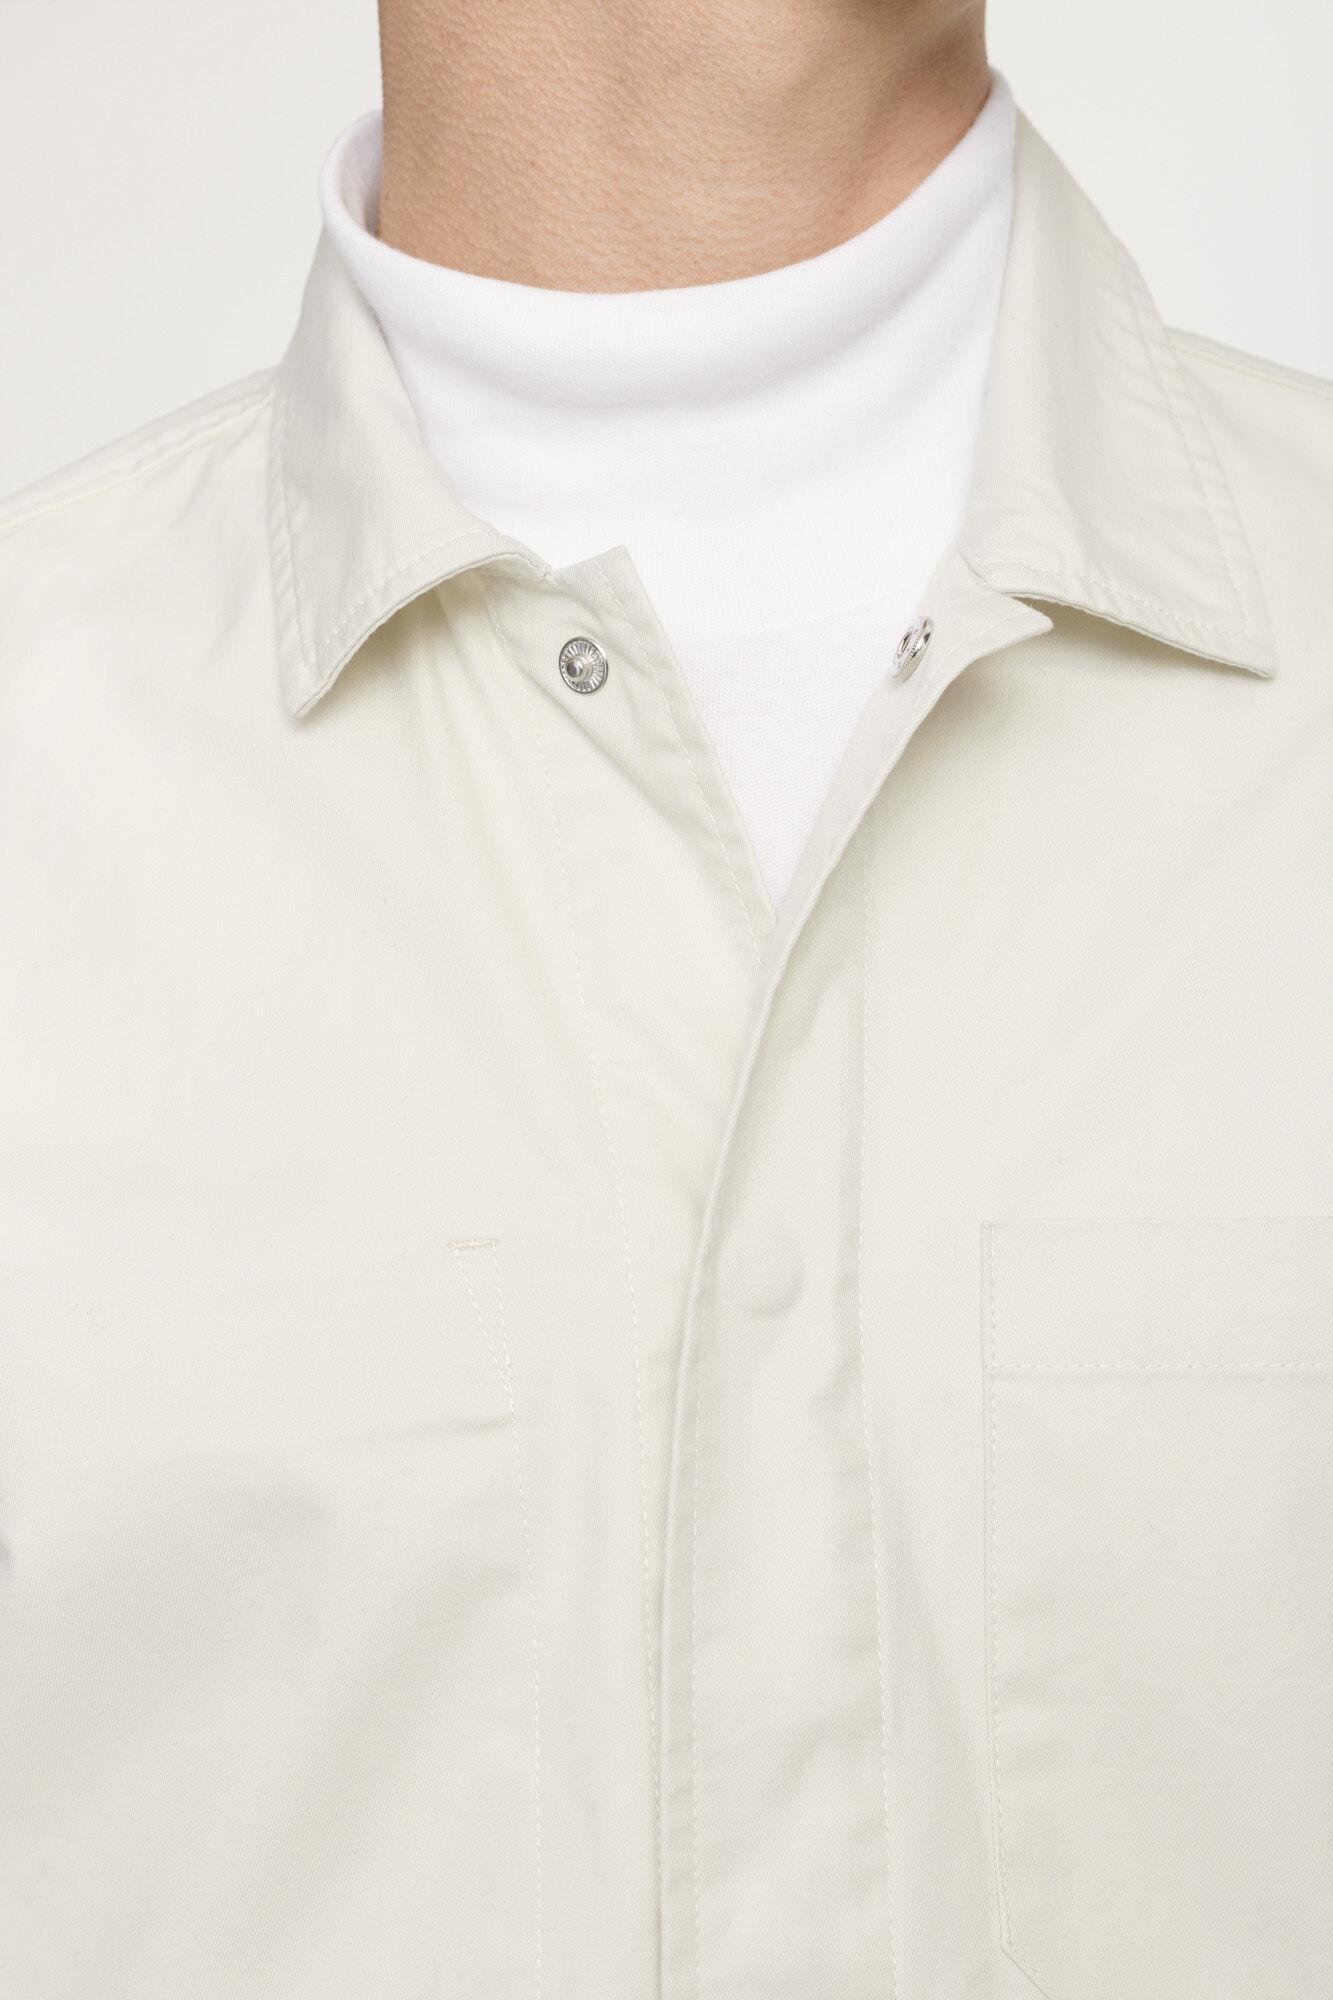 Ruffe shirt 11052